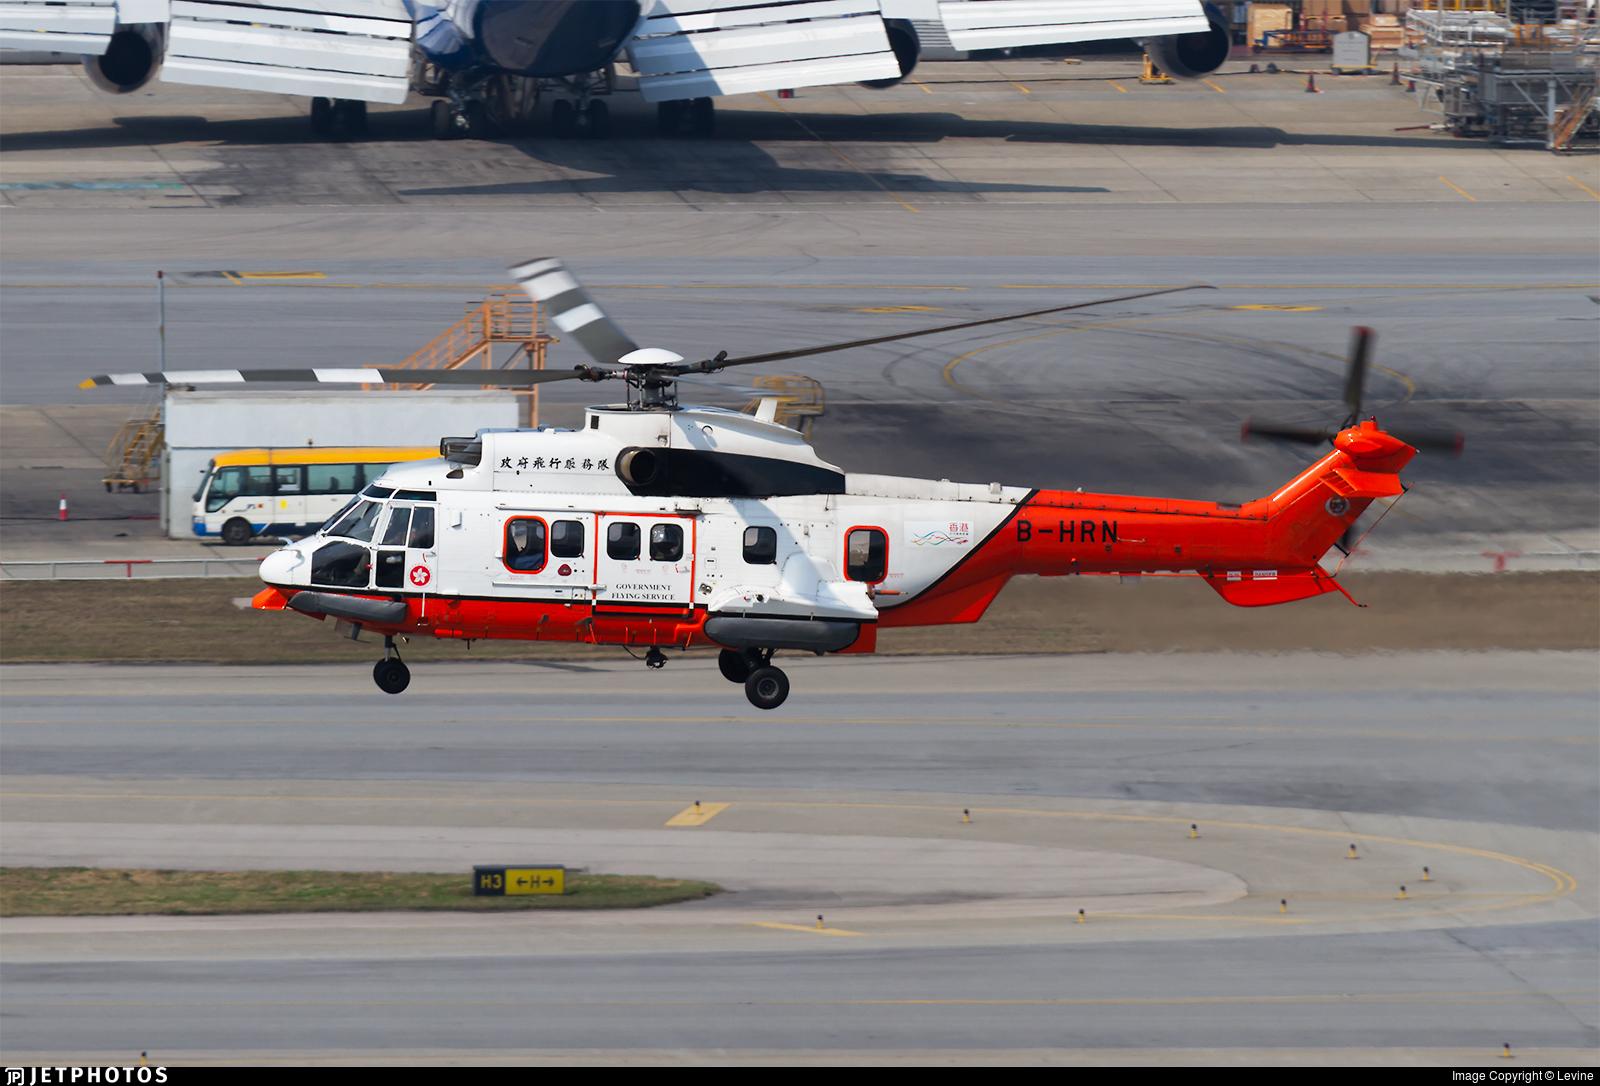 B-HRN - Aérospatiale AS 332L2 Super Puma - Hong Kong - Government Flying Service (GFS)